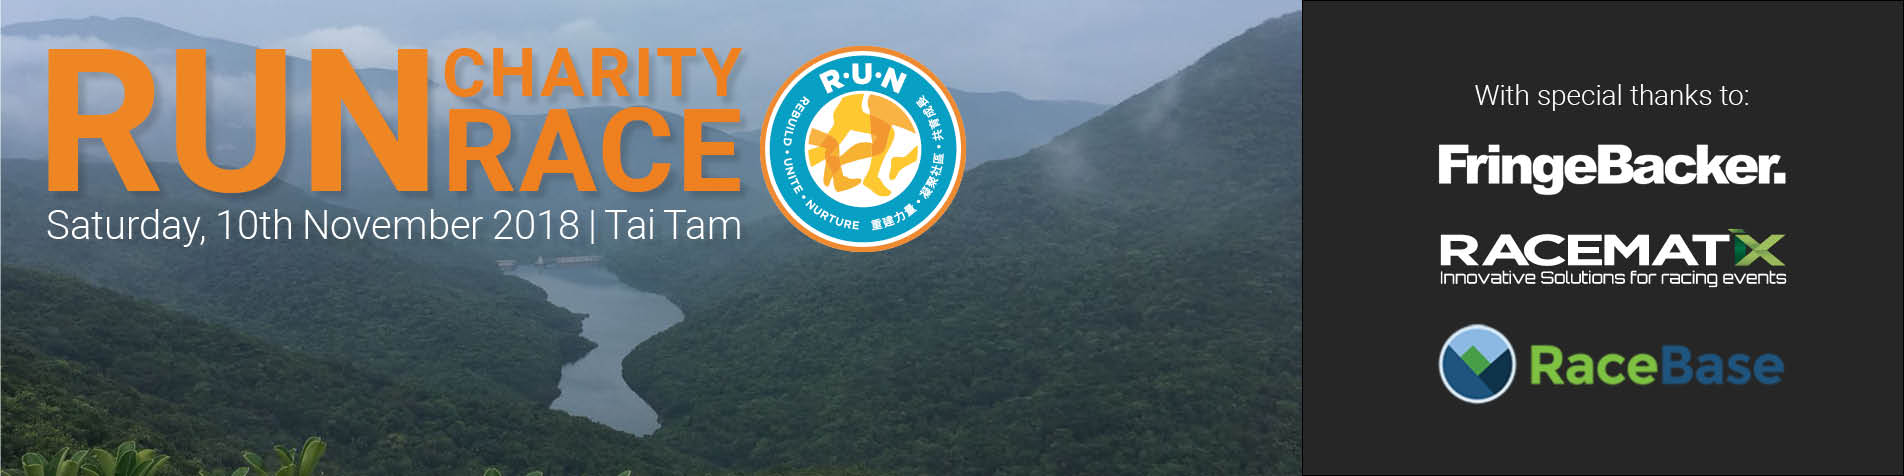 FringeBacker Fundraiser RUN Charity Race 2018